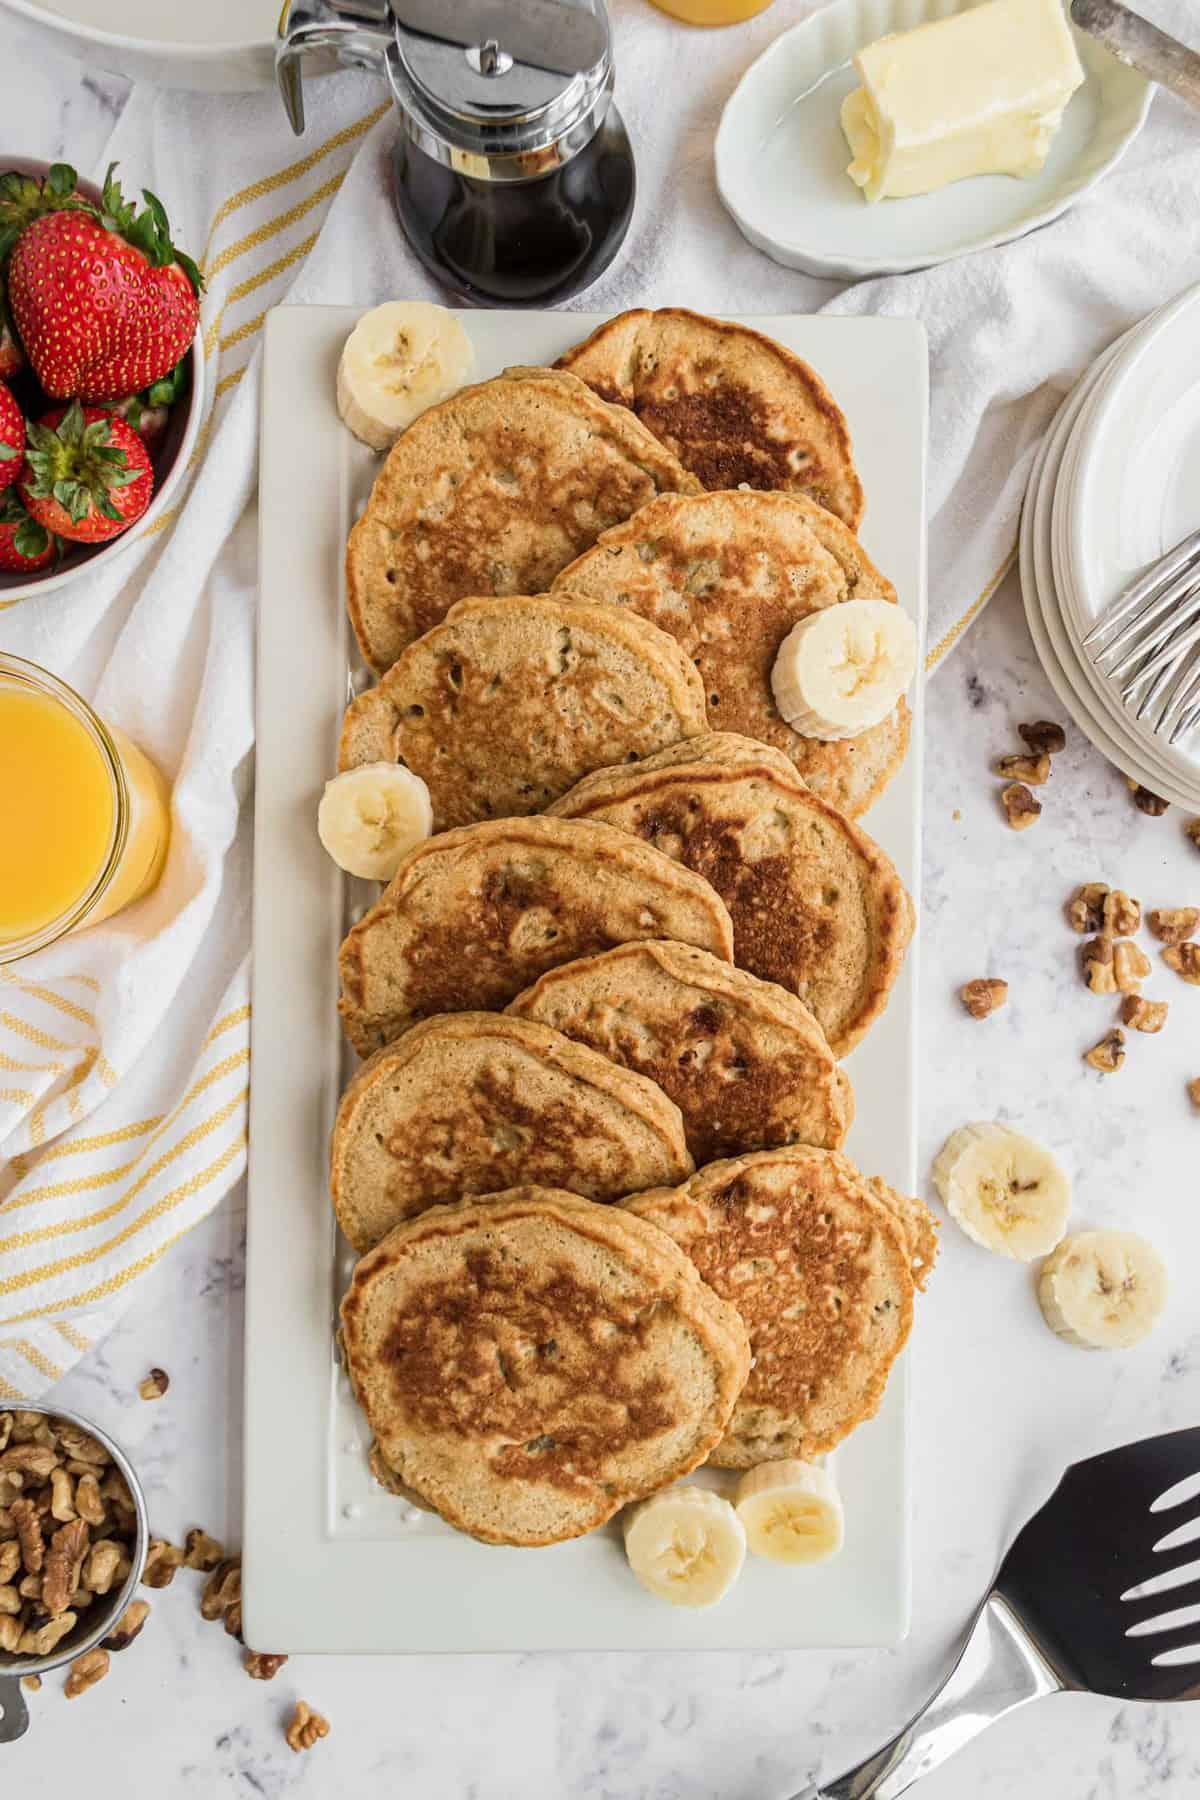 Pancakes on a large white platter.